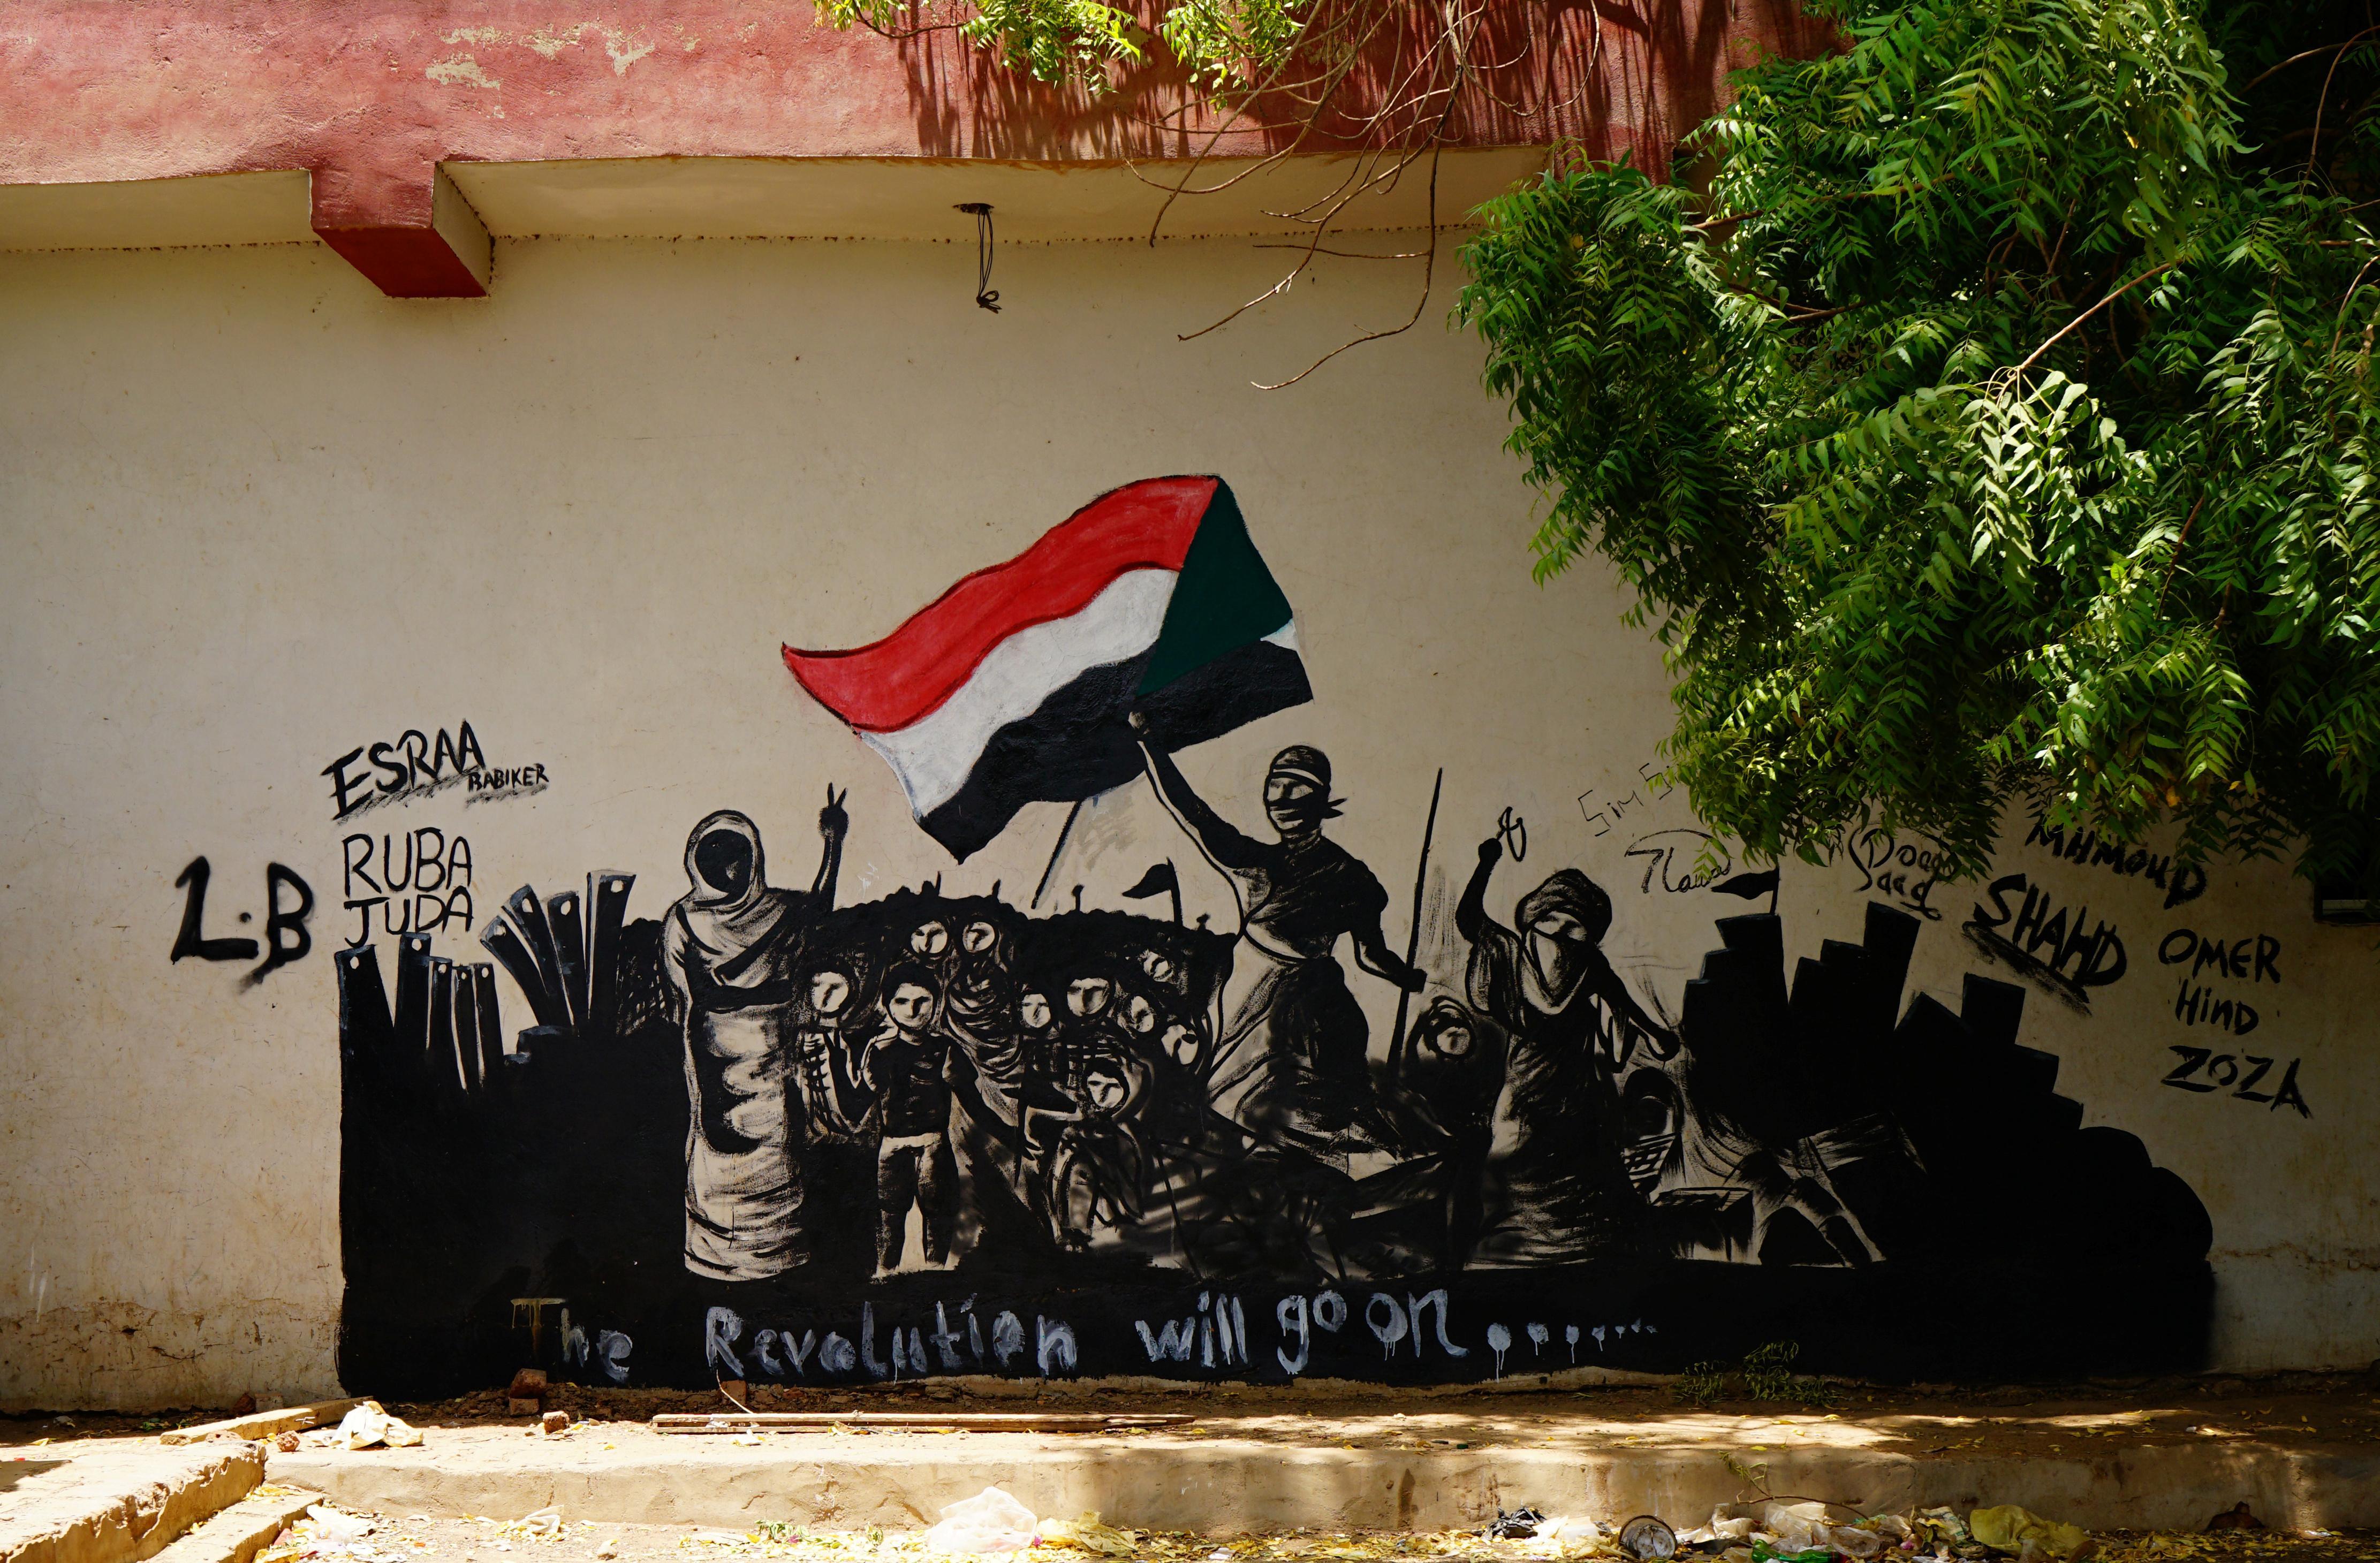 Sudan's military council dismisses public prosecutor, appoints replacement - sources